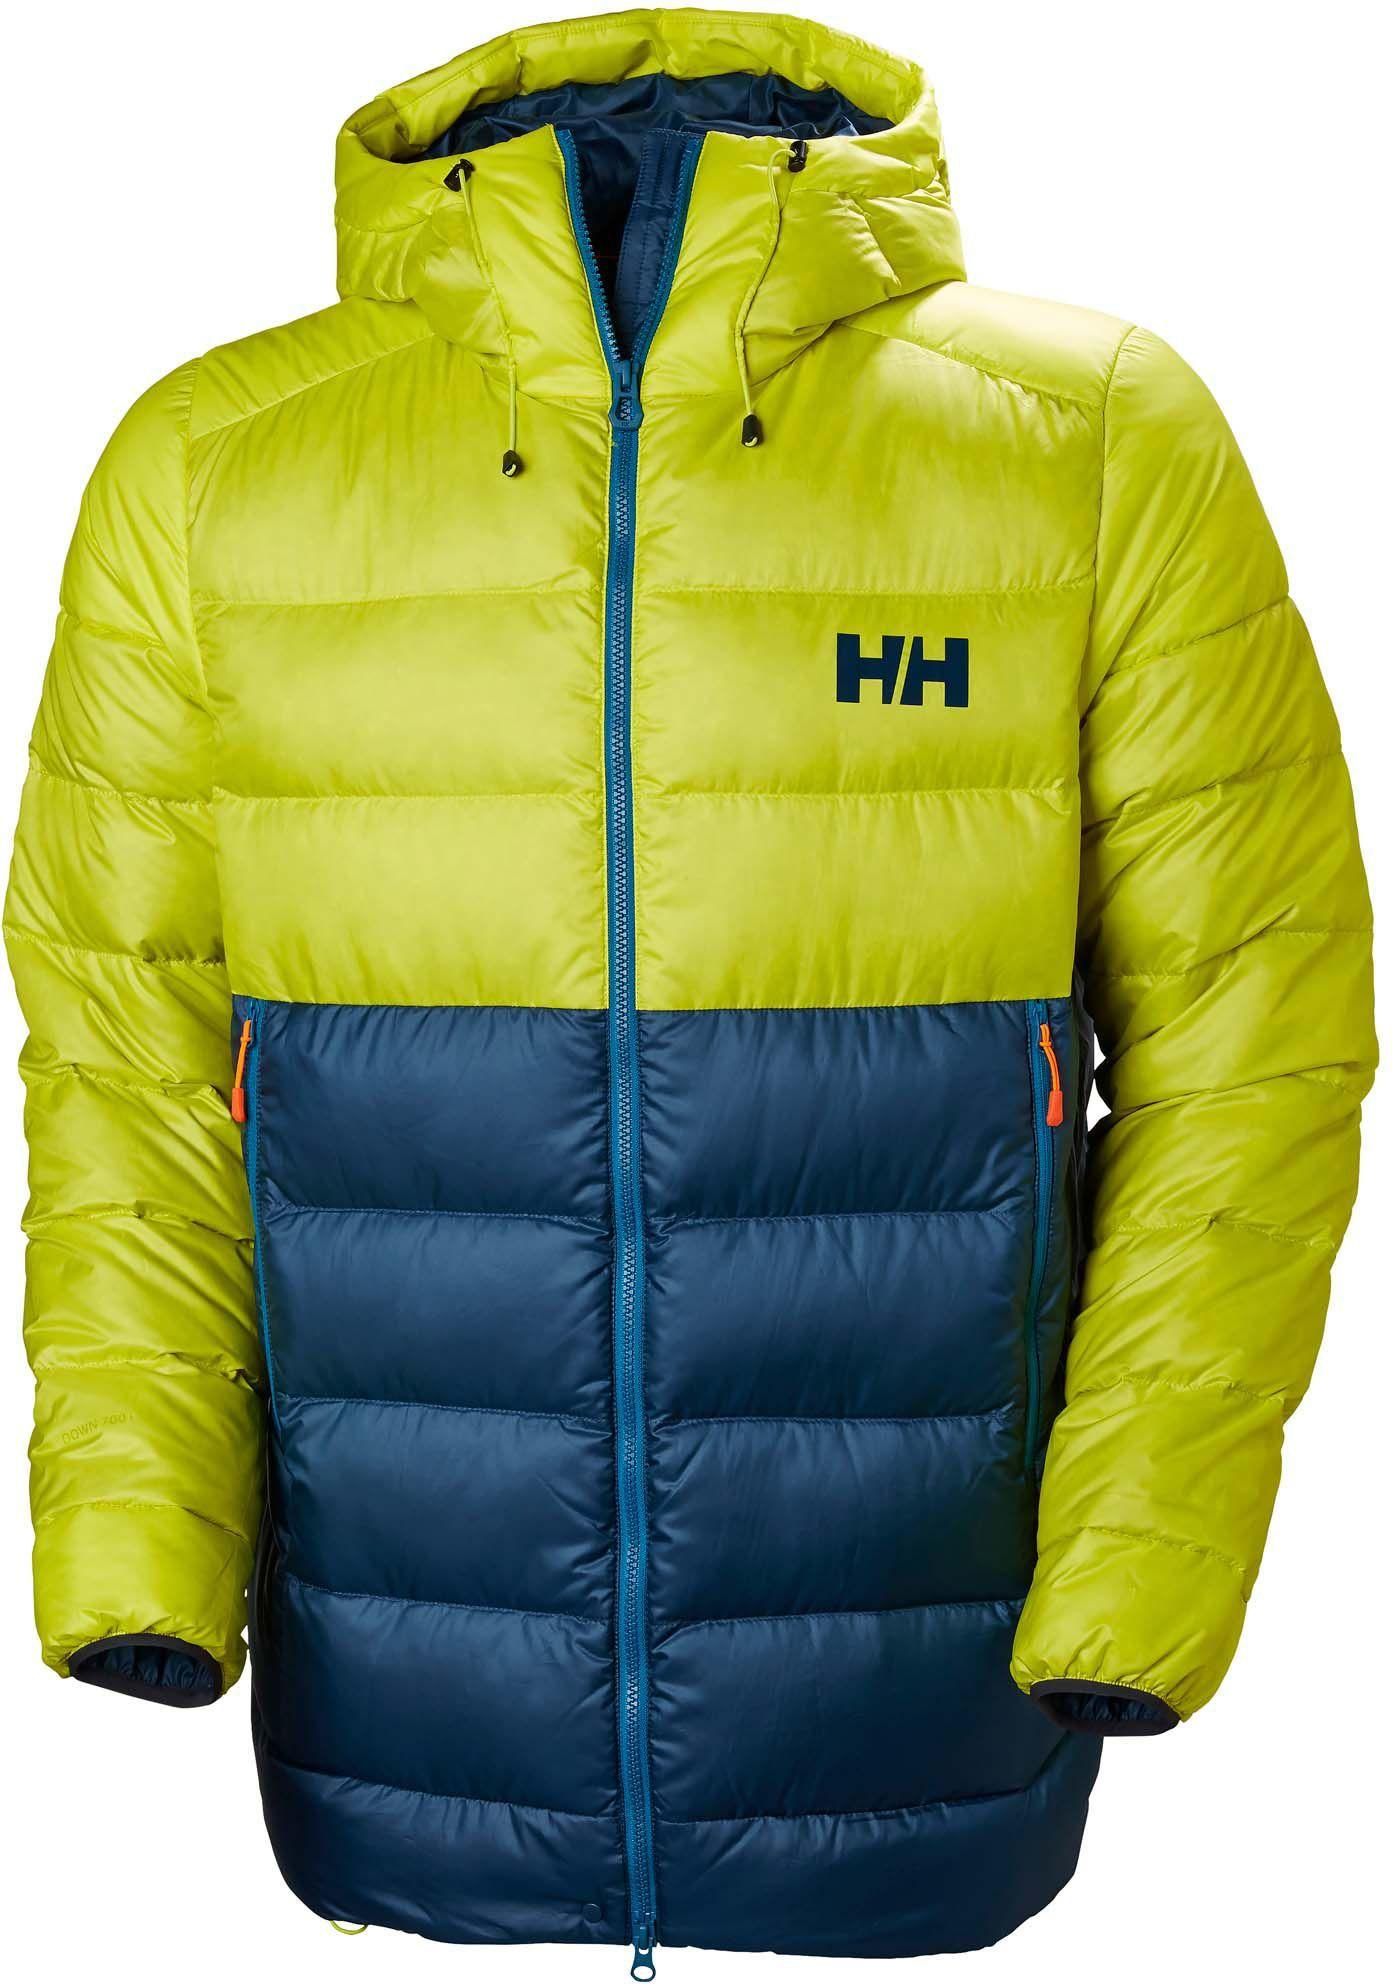 c142d92f Best pris på Helly Hansen Vanir Glacier Down (Herre) - Se priser før kjøp i  Prisguiden